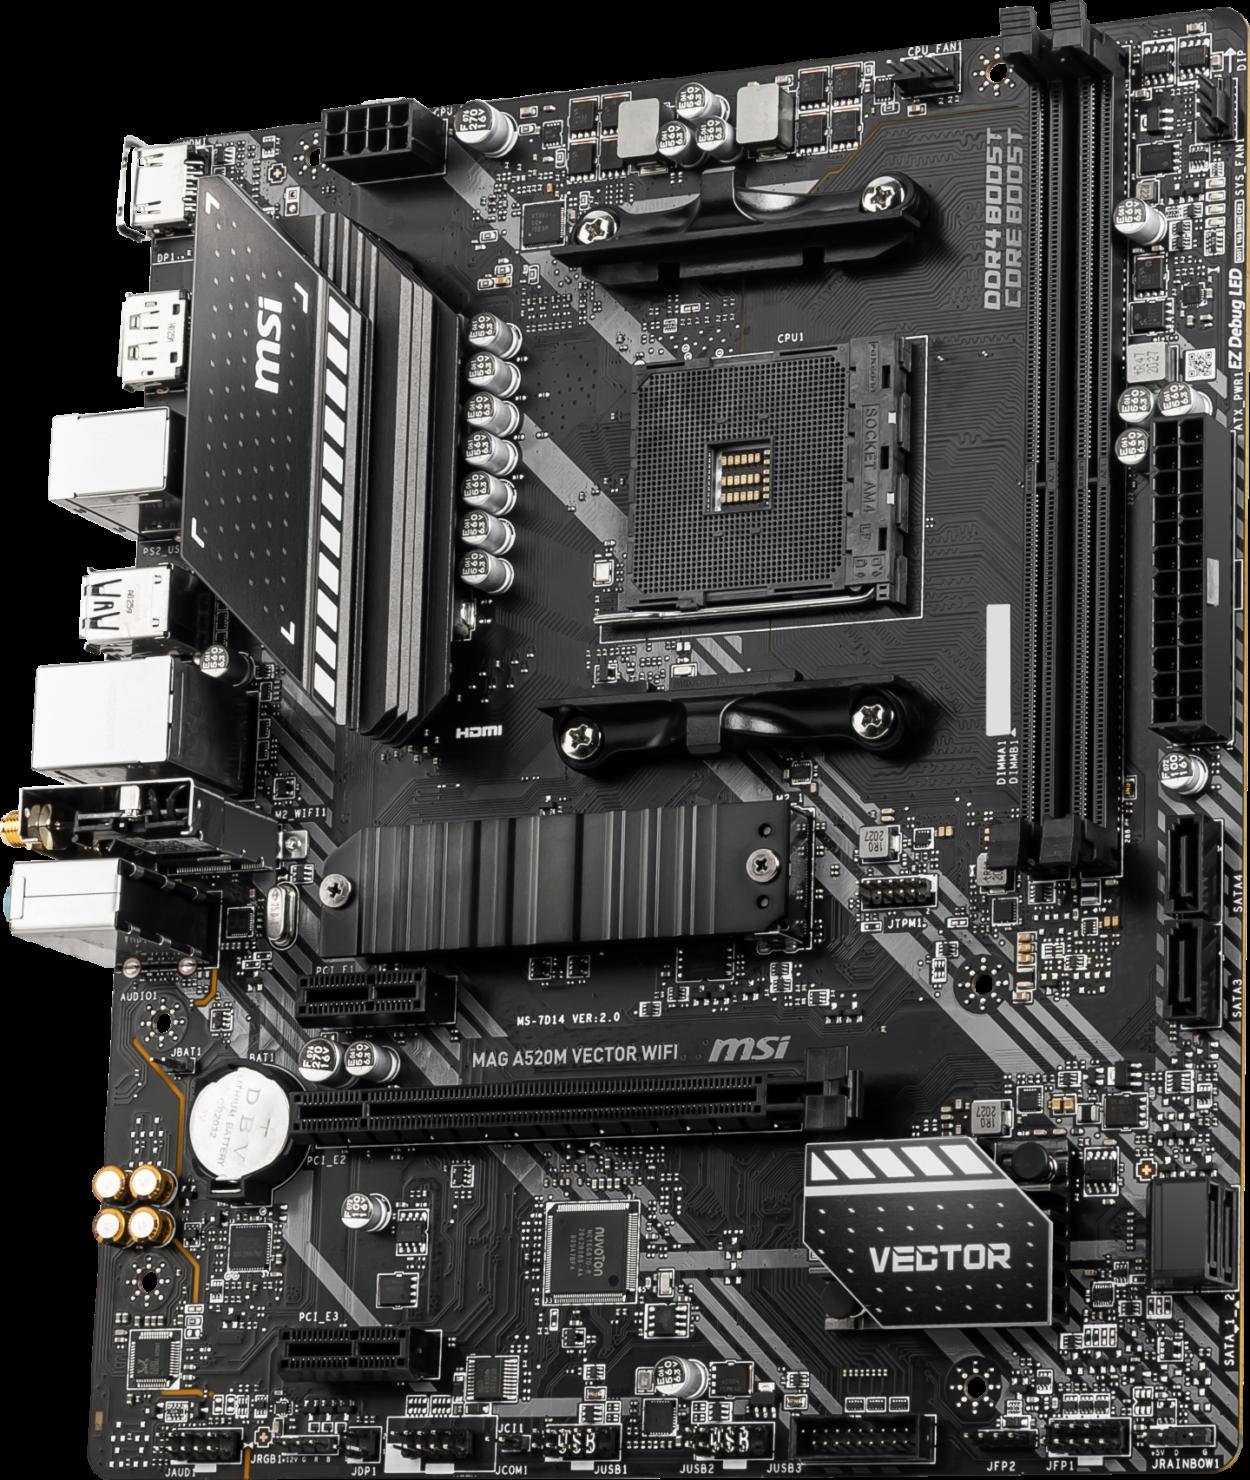 msi-mag_a520m_vector_wifi-3d2-custom